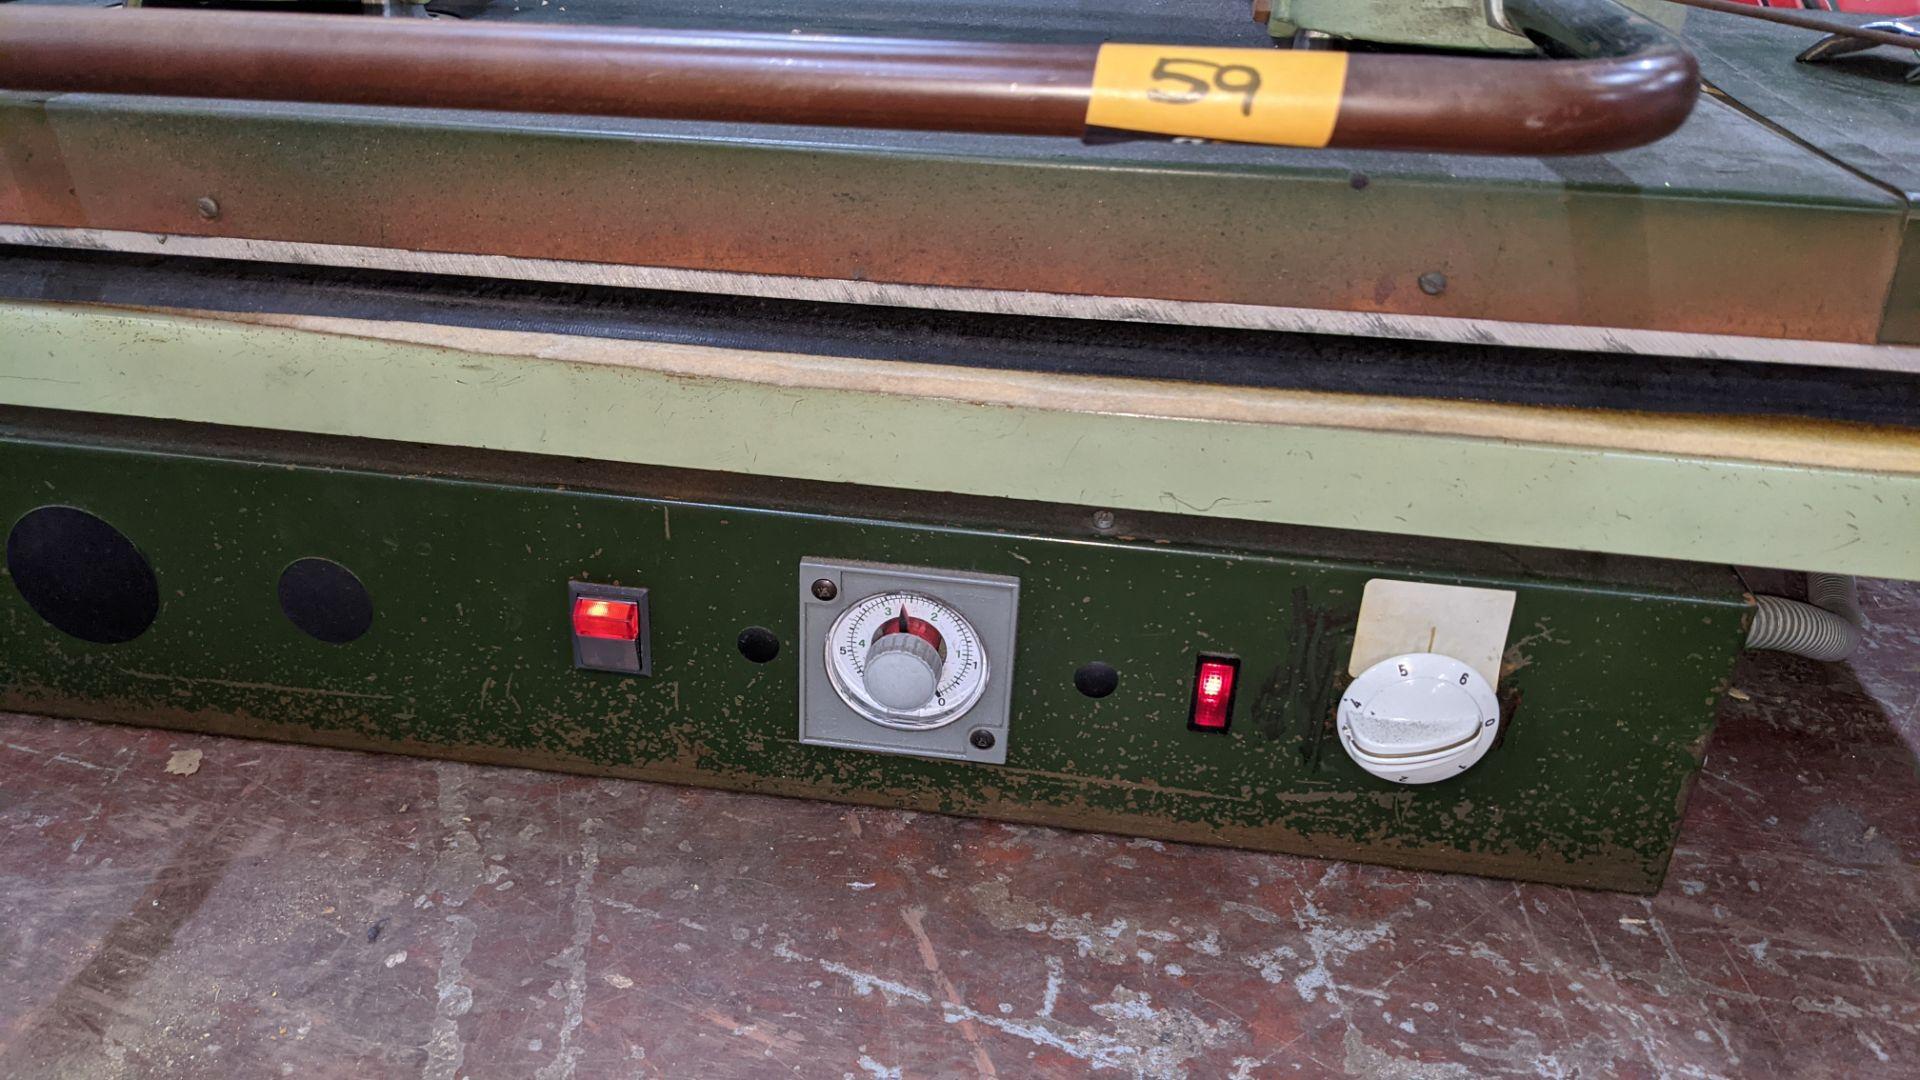 BW large benchtop heat press - Image 12 of 12